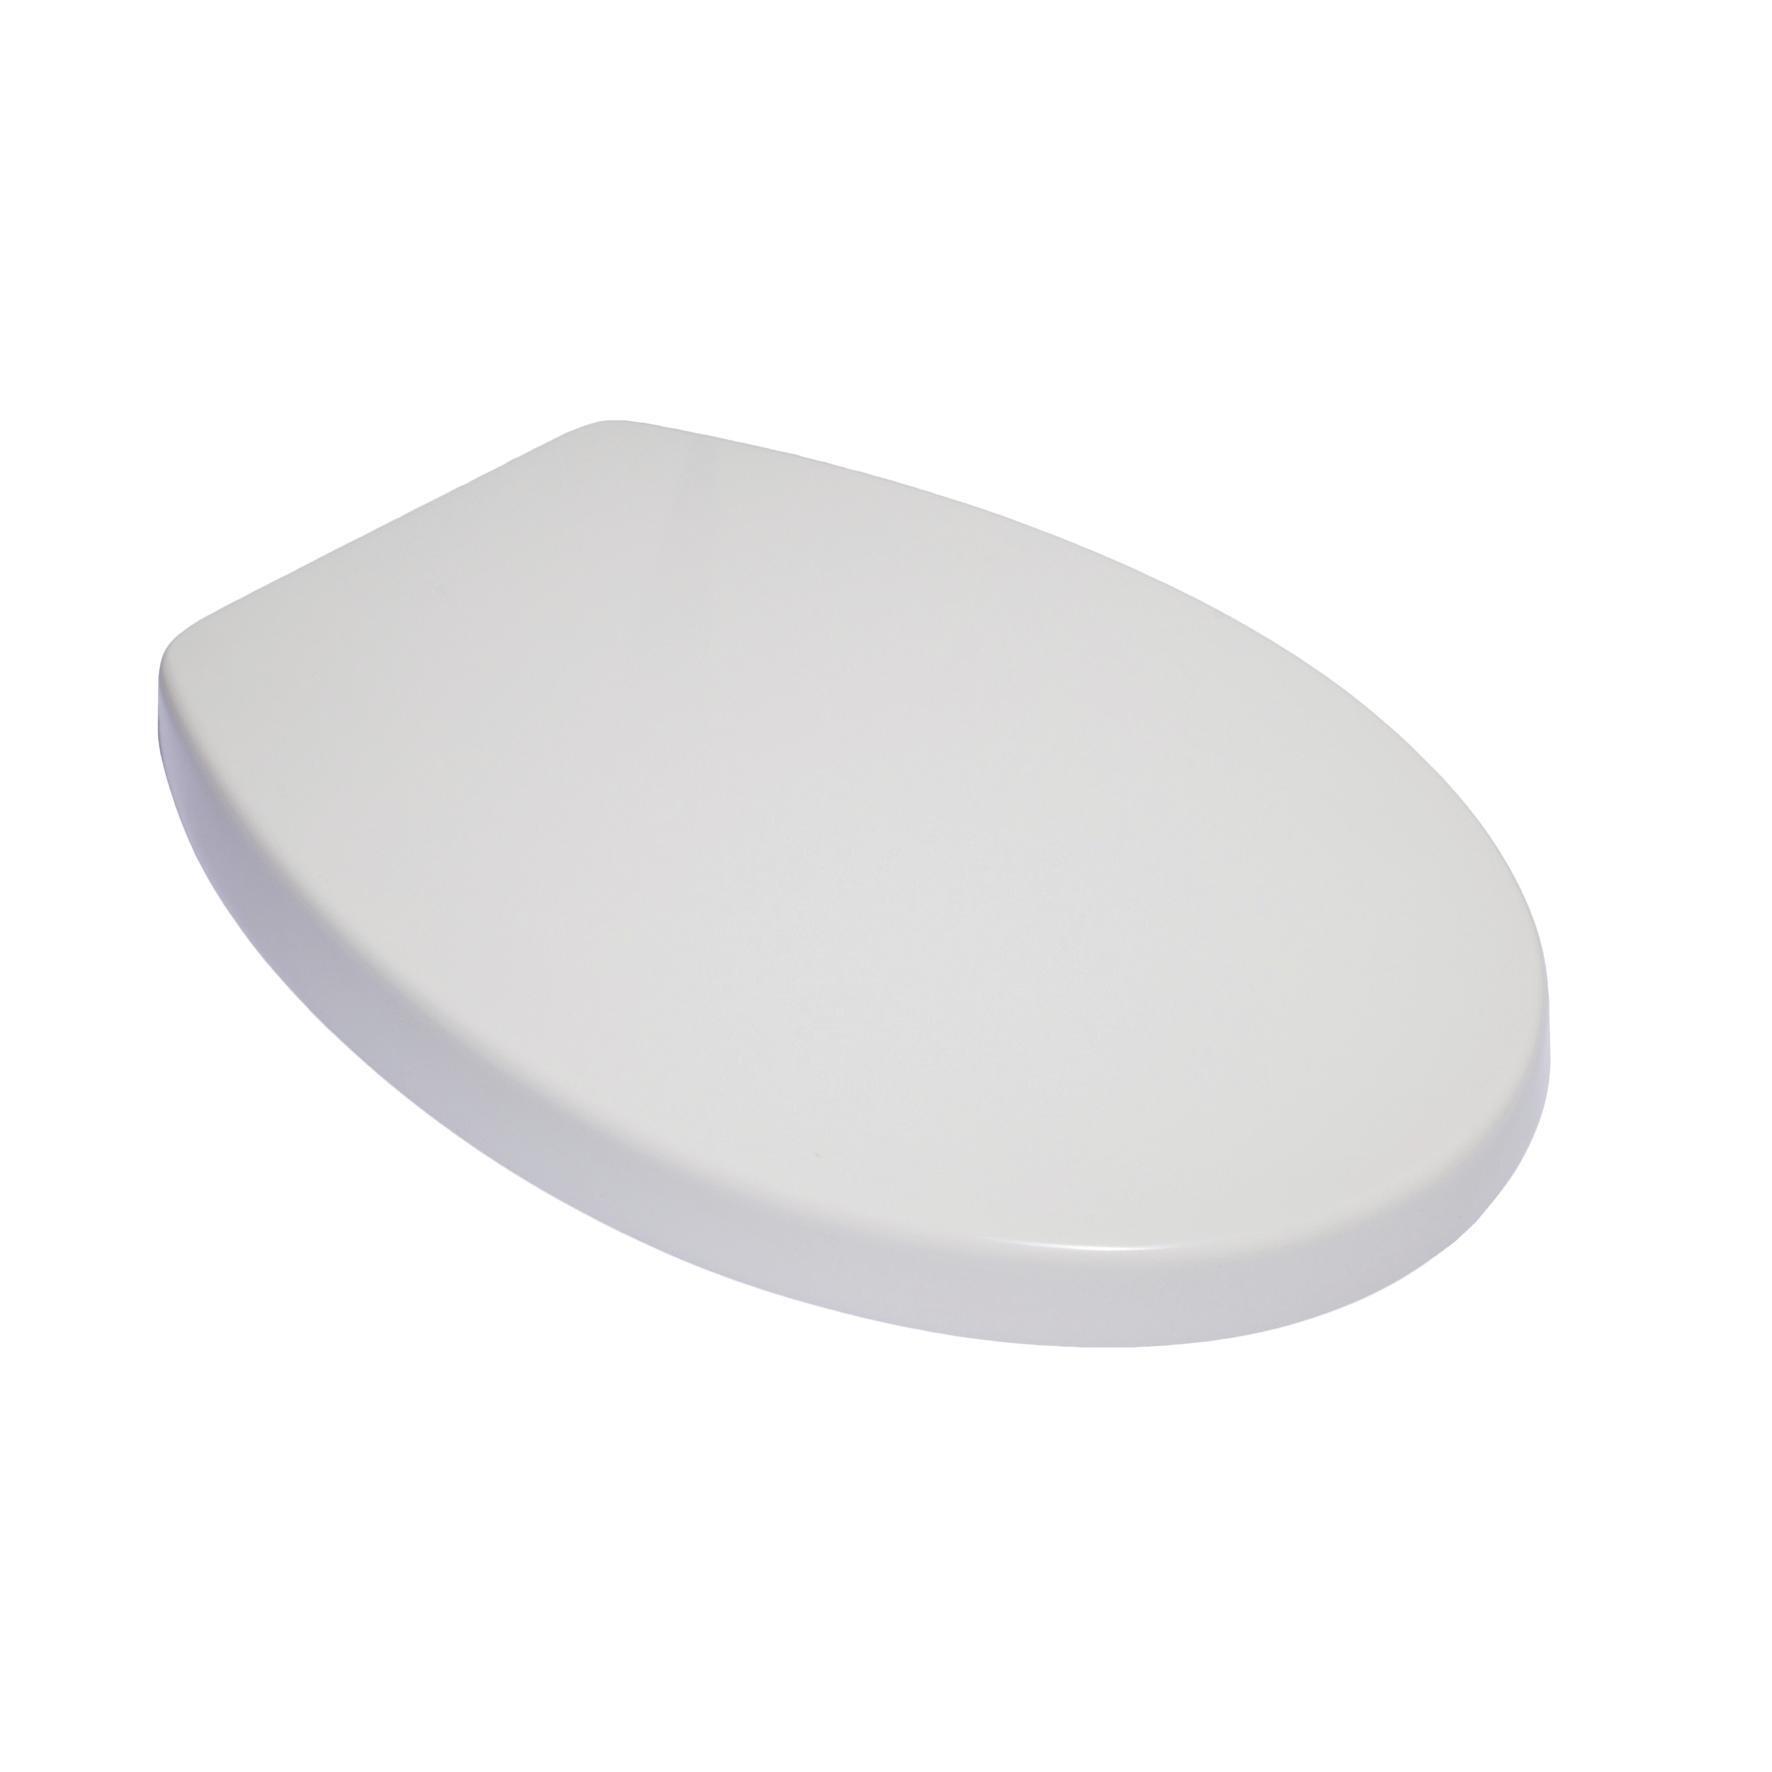 Copriwater ovale Originale per serie sanitari Idyl IDEAL STANDARD termoindurente bianco - 4